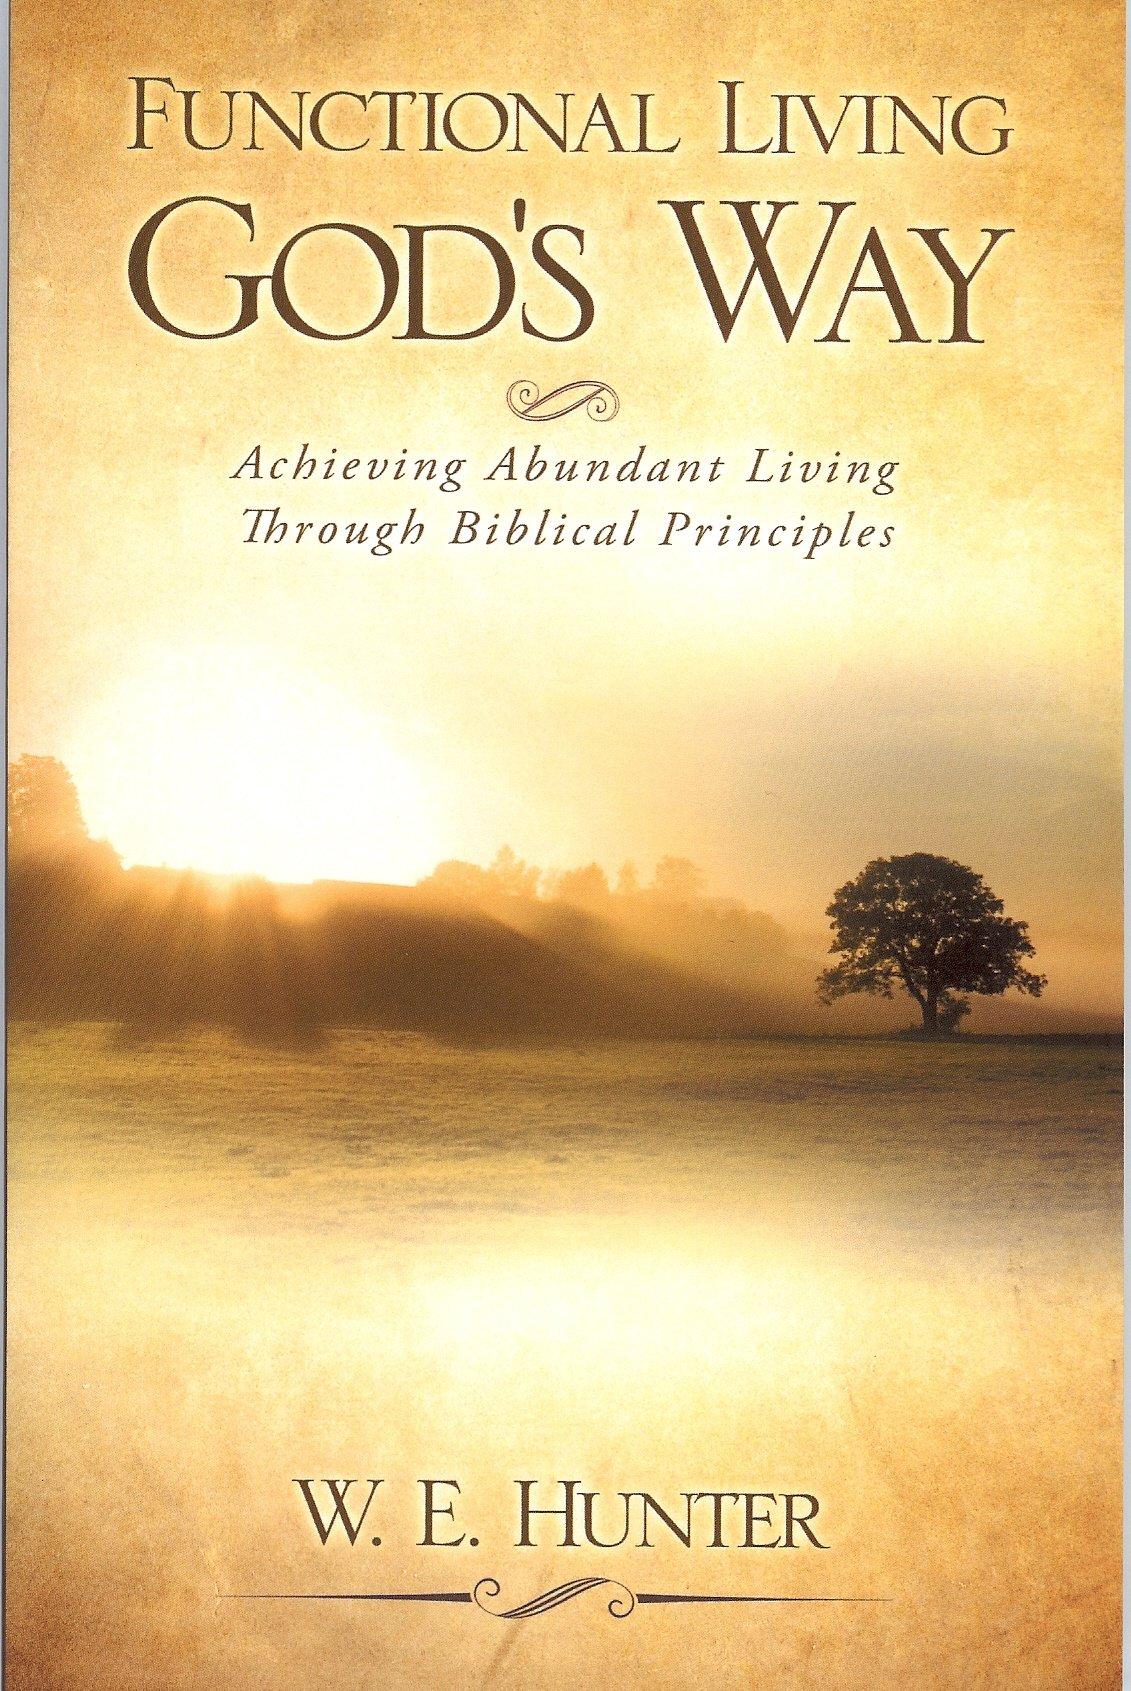 Functional Living God's Way: W  E  Hunter: 9781615798315